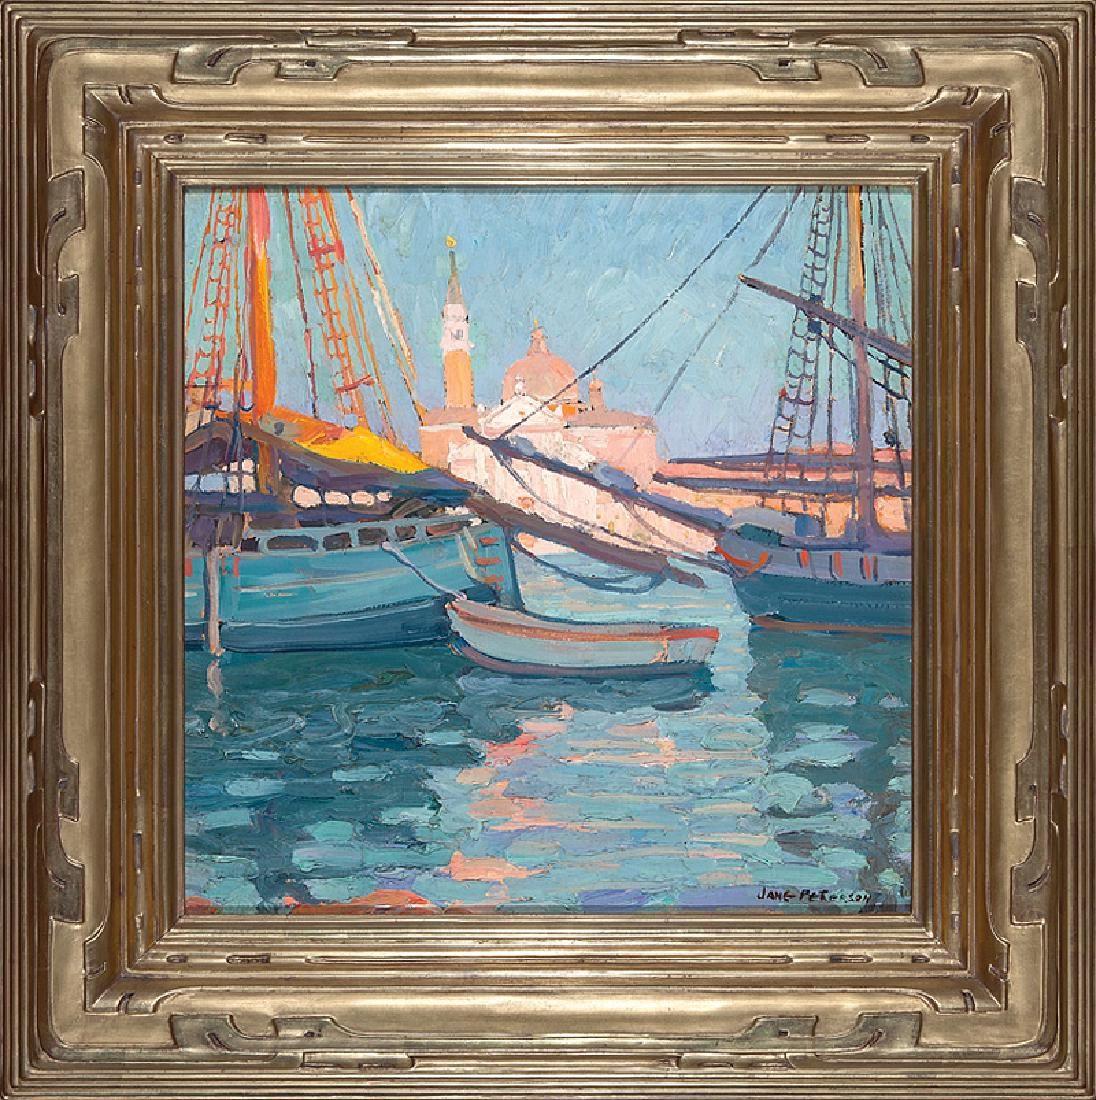 Jane Peterson (American/Illinois, 1876-1965)